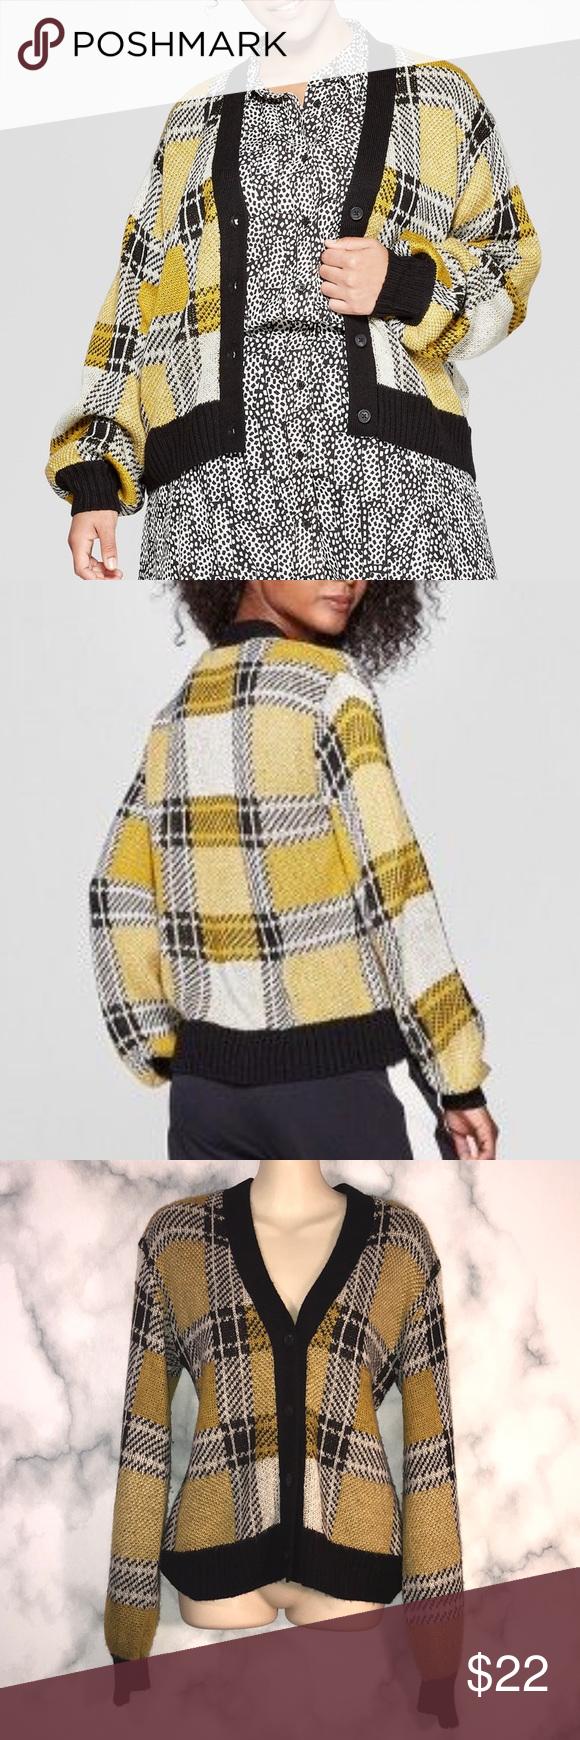 NWT WHO WHAT WEAR yellow plaid cardigan M NWT WHO WHAT WEAR yellow & black plaid…